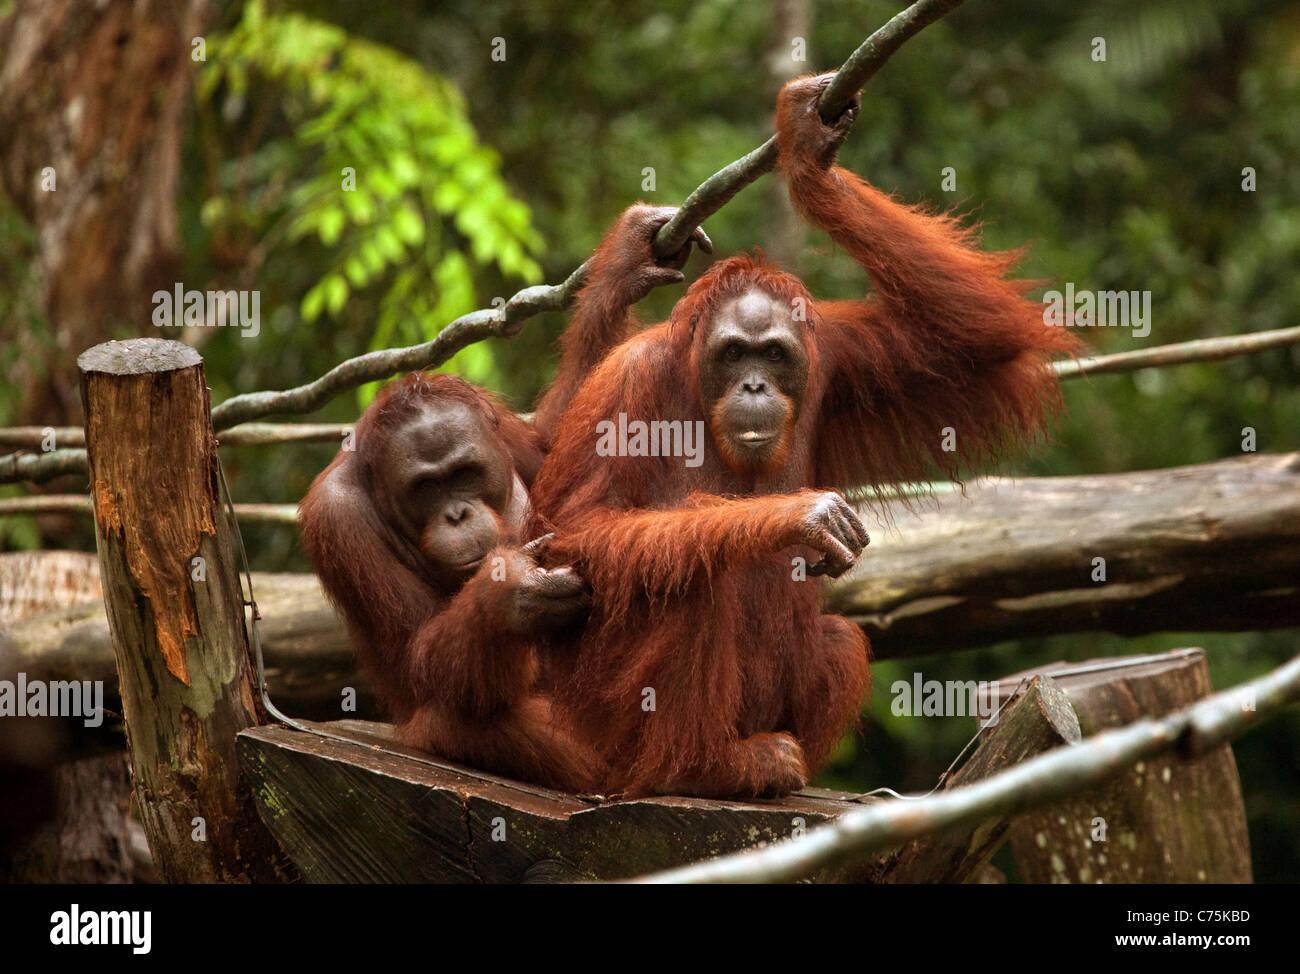 Zwei Erwachsene Bornean Orang-Utans (Pongo Pygmaeus) im Zoo von Singapur, Singapur Asien Stockbild